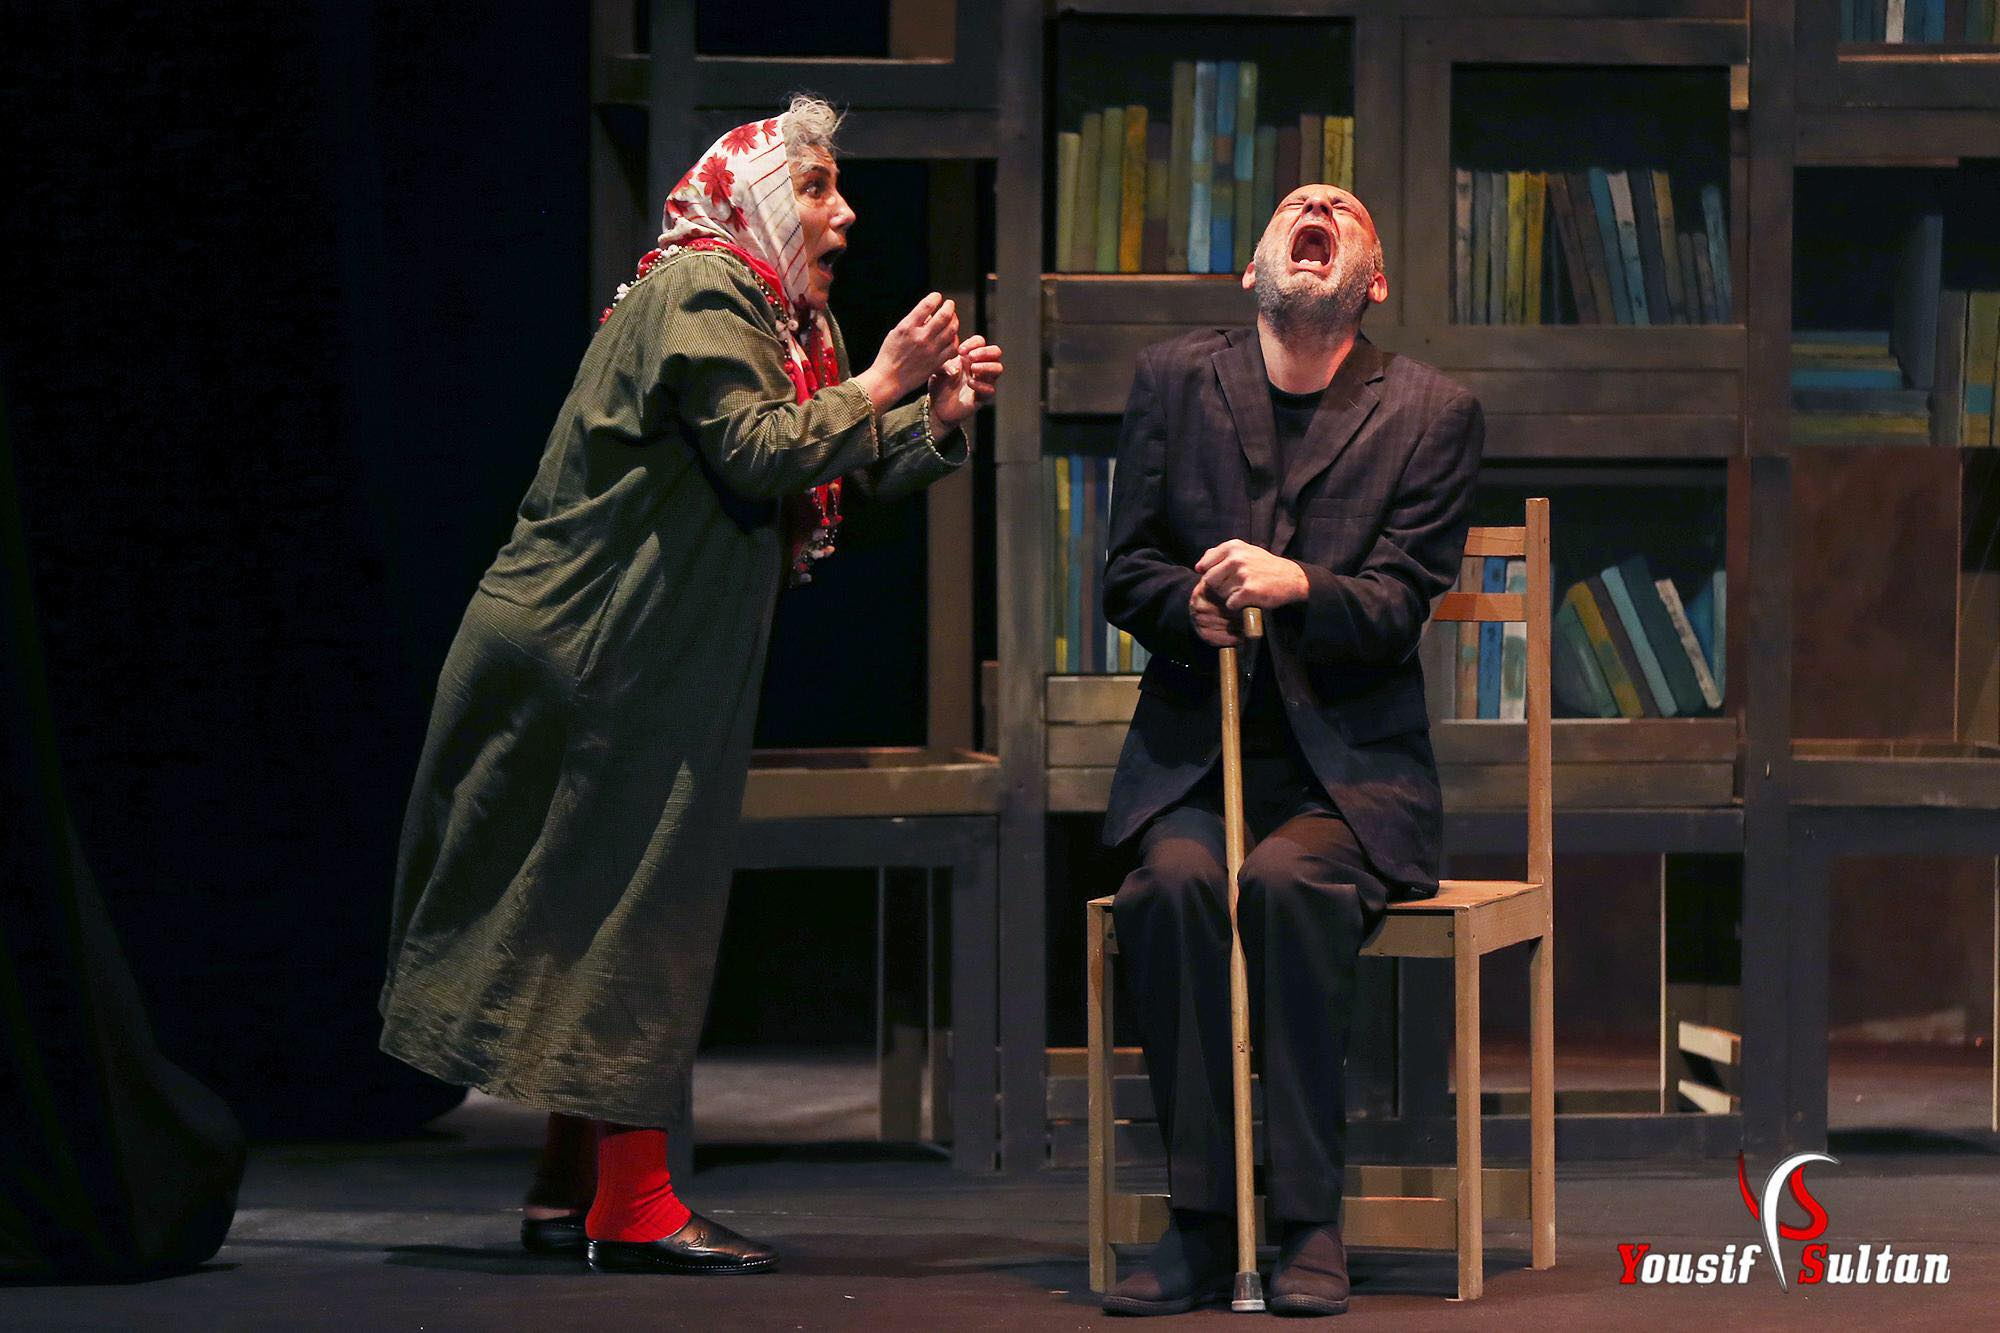 Awal Theatre International